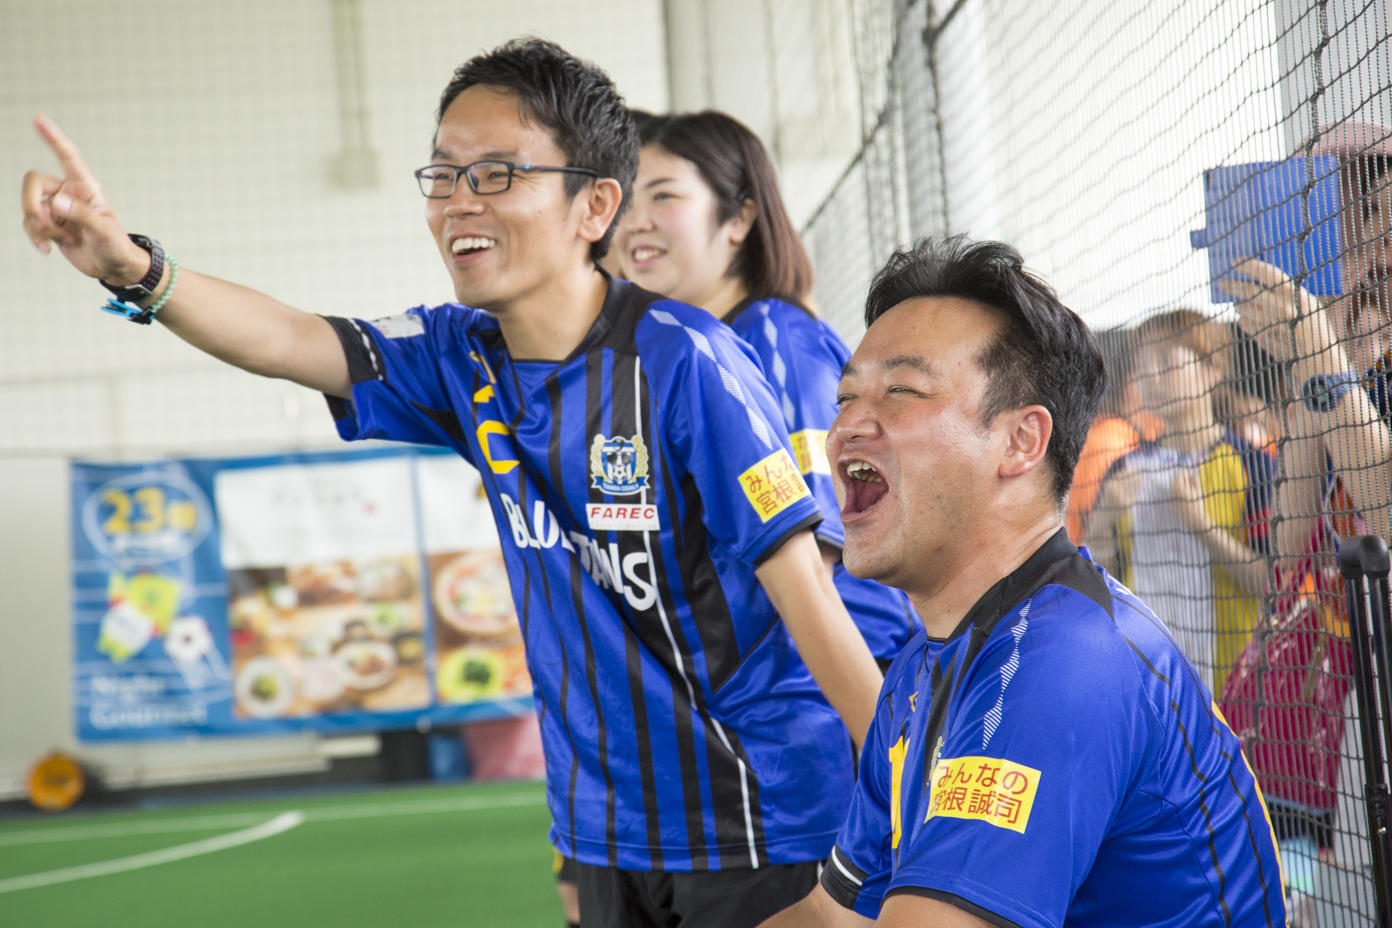 http://news.yoshimoto.co.jp/20170802174347-9ff42b8e10153d7a9e98abbd62c3a2ec7c9b8692.jpg